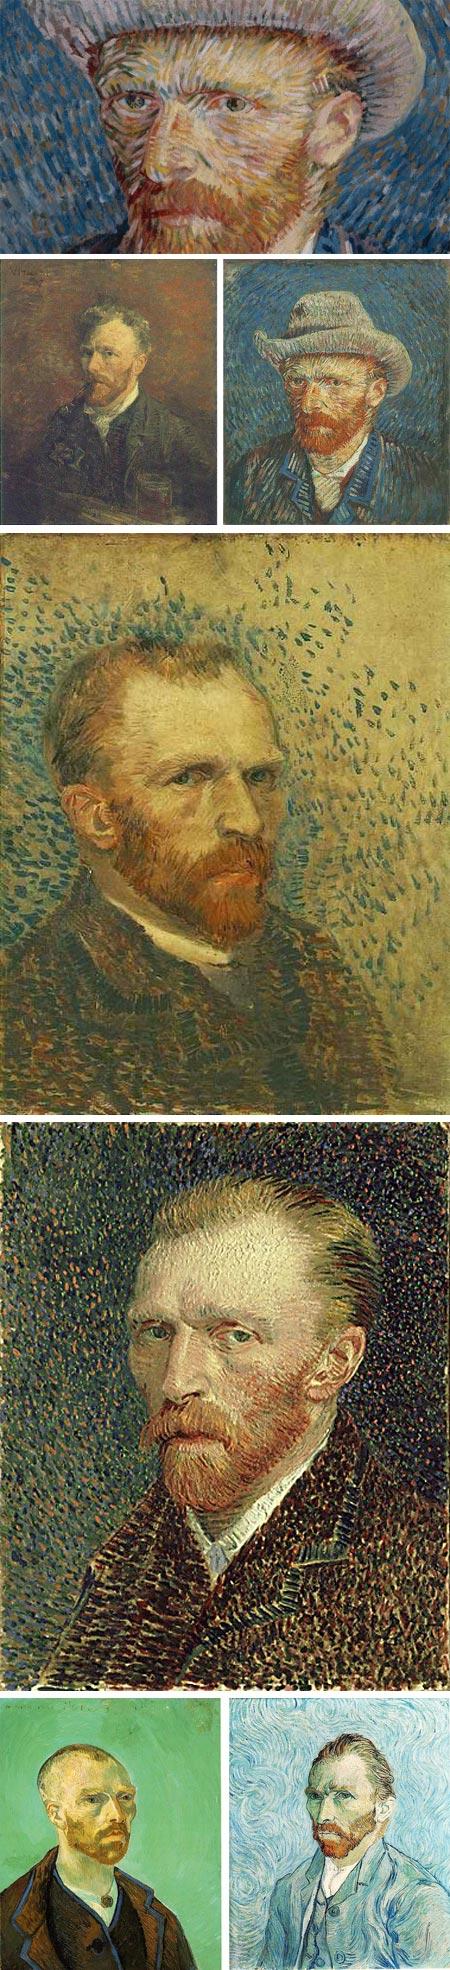 Van Gogh's self-portraits